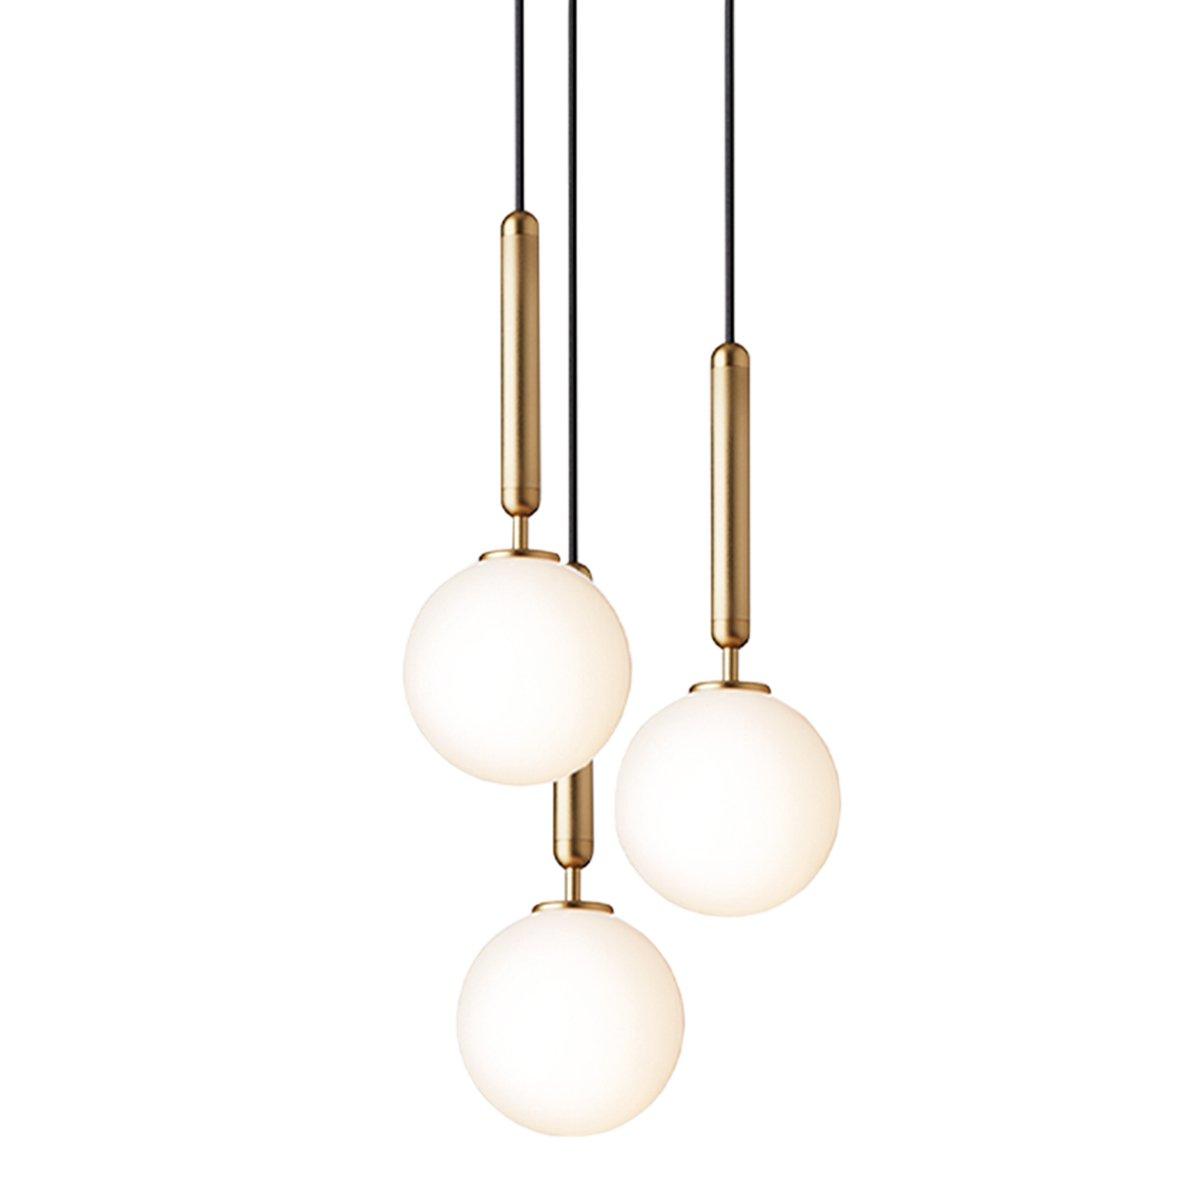 Nuura Miira 3 Hanglamp Medium - Brass / Opal White